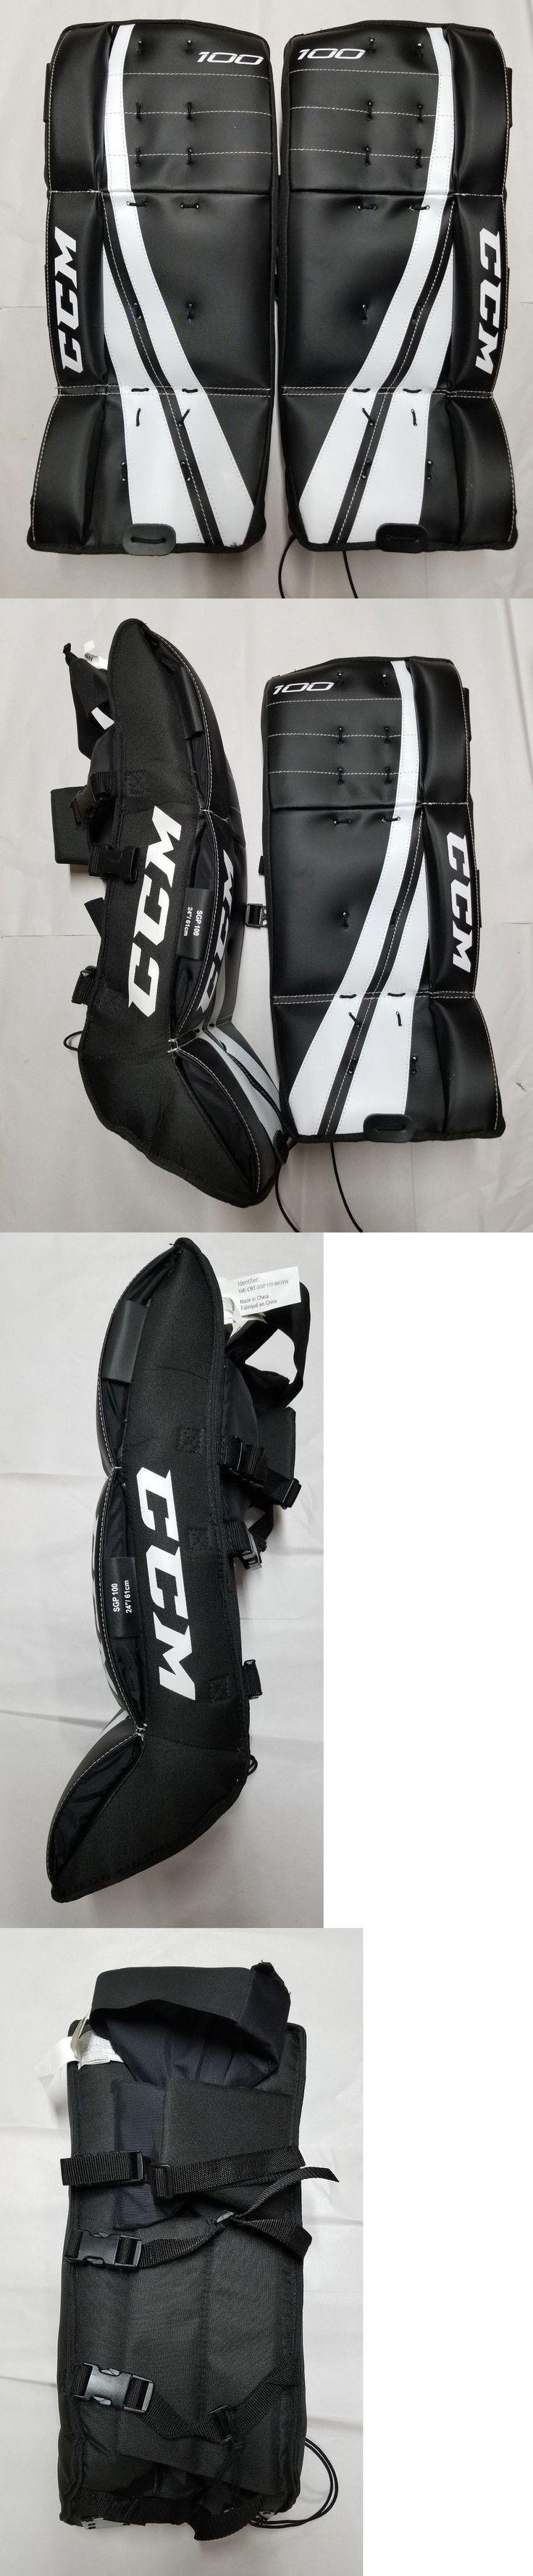 Gloves and Blockers 79763: Ccm 100 Street Hockey Goalie Pads Junior Regular 20 -> BUY IT NOW ONLY: $64.99 on eBay!